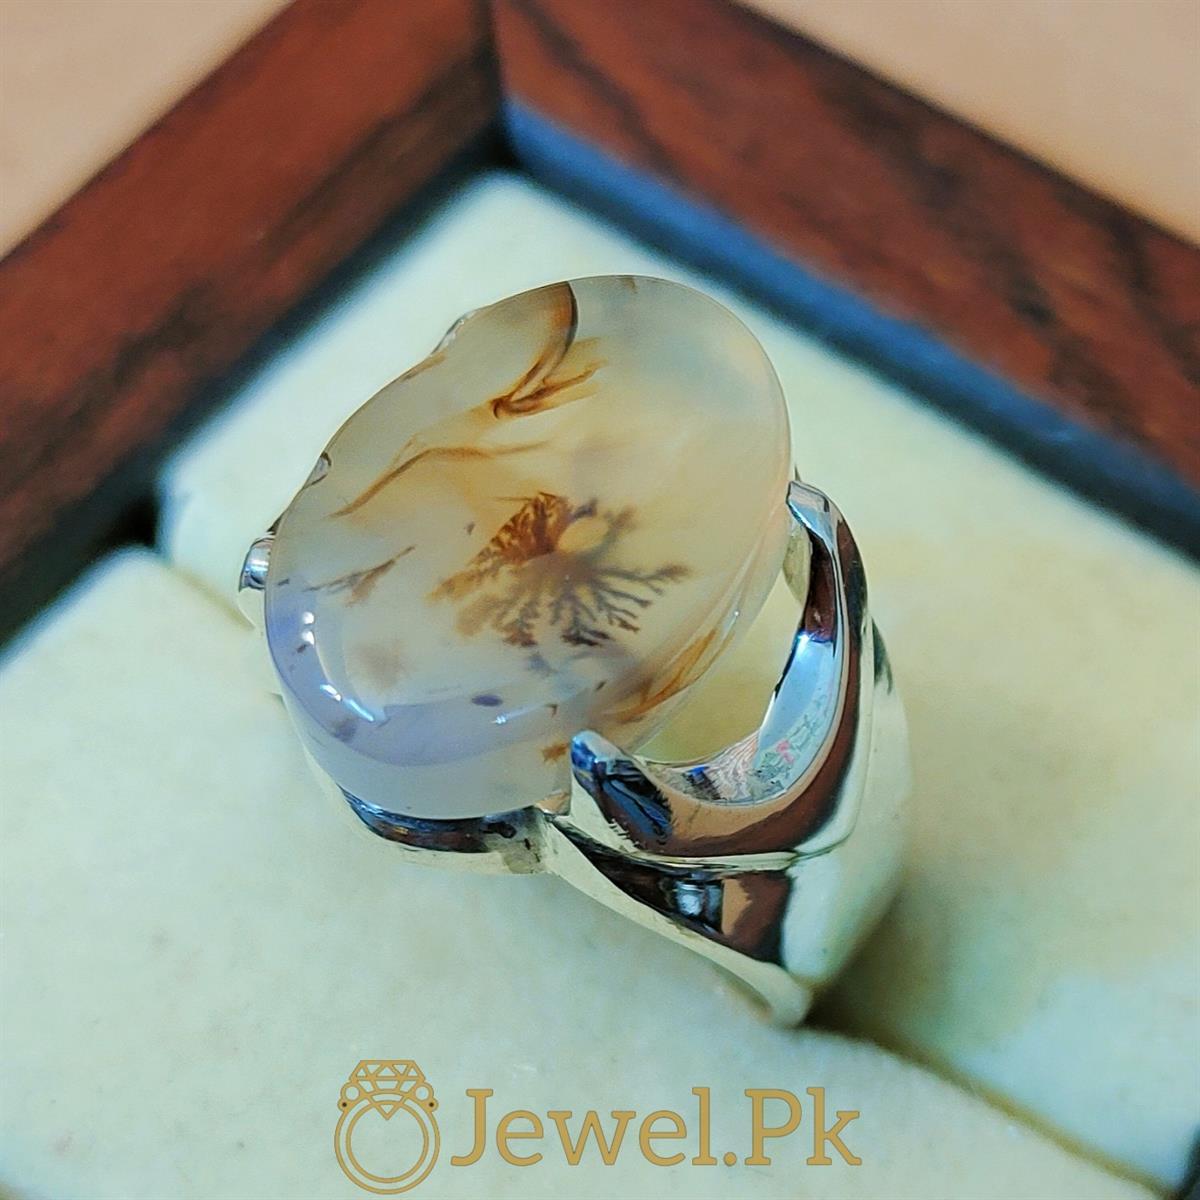 Natural Yemeni Agate Yamni Aqeeq Aiqi Haqiq ring 3 natural gemstones pakistan + 925 silver jewelry online